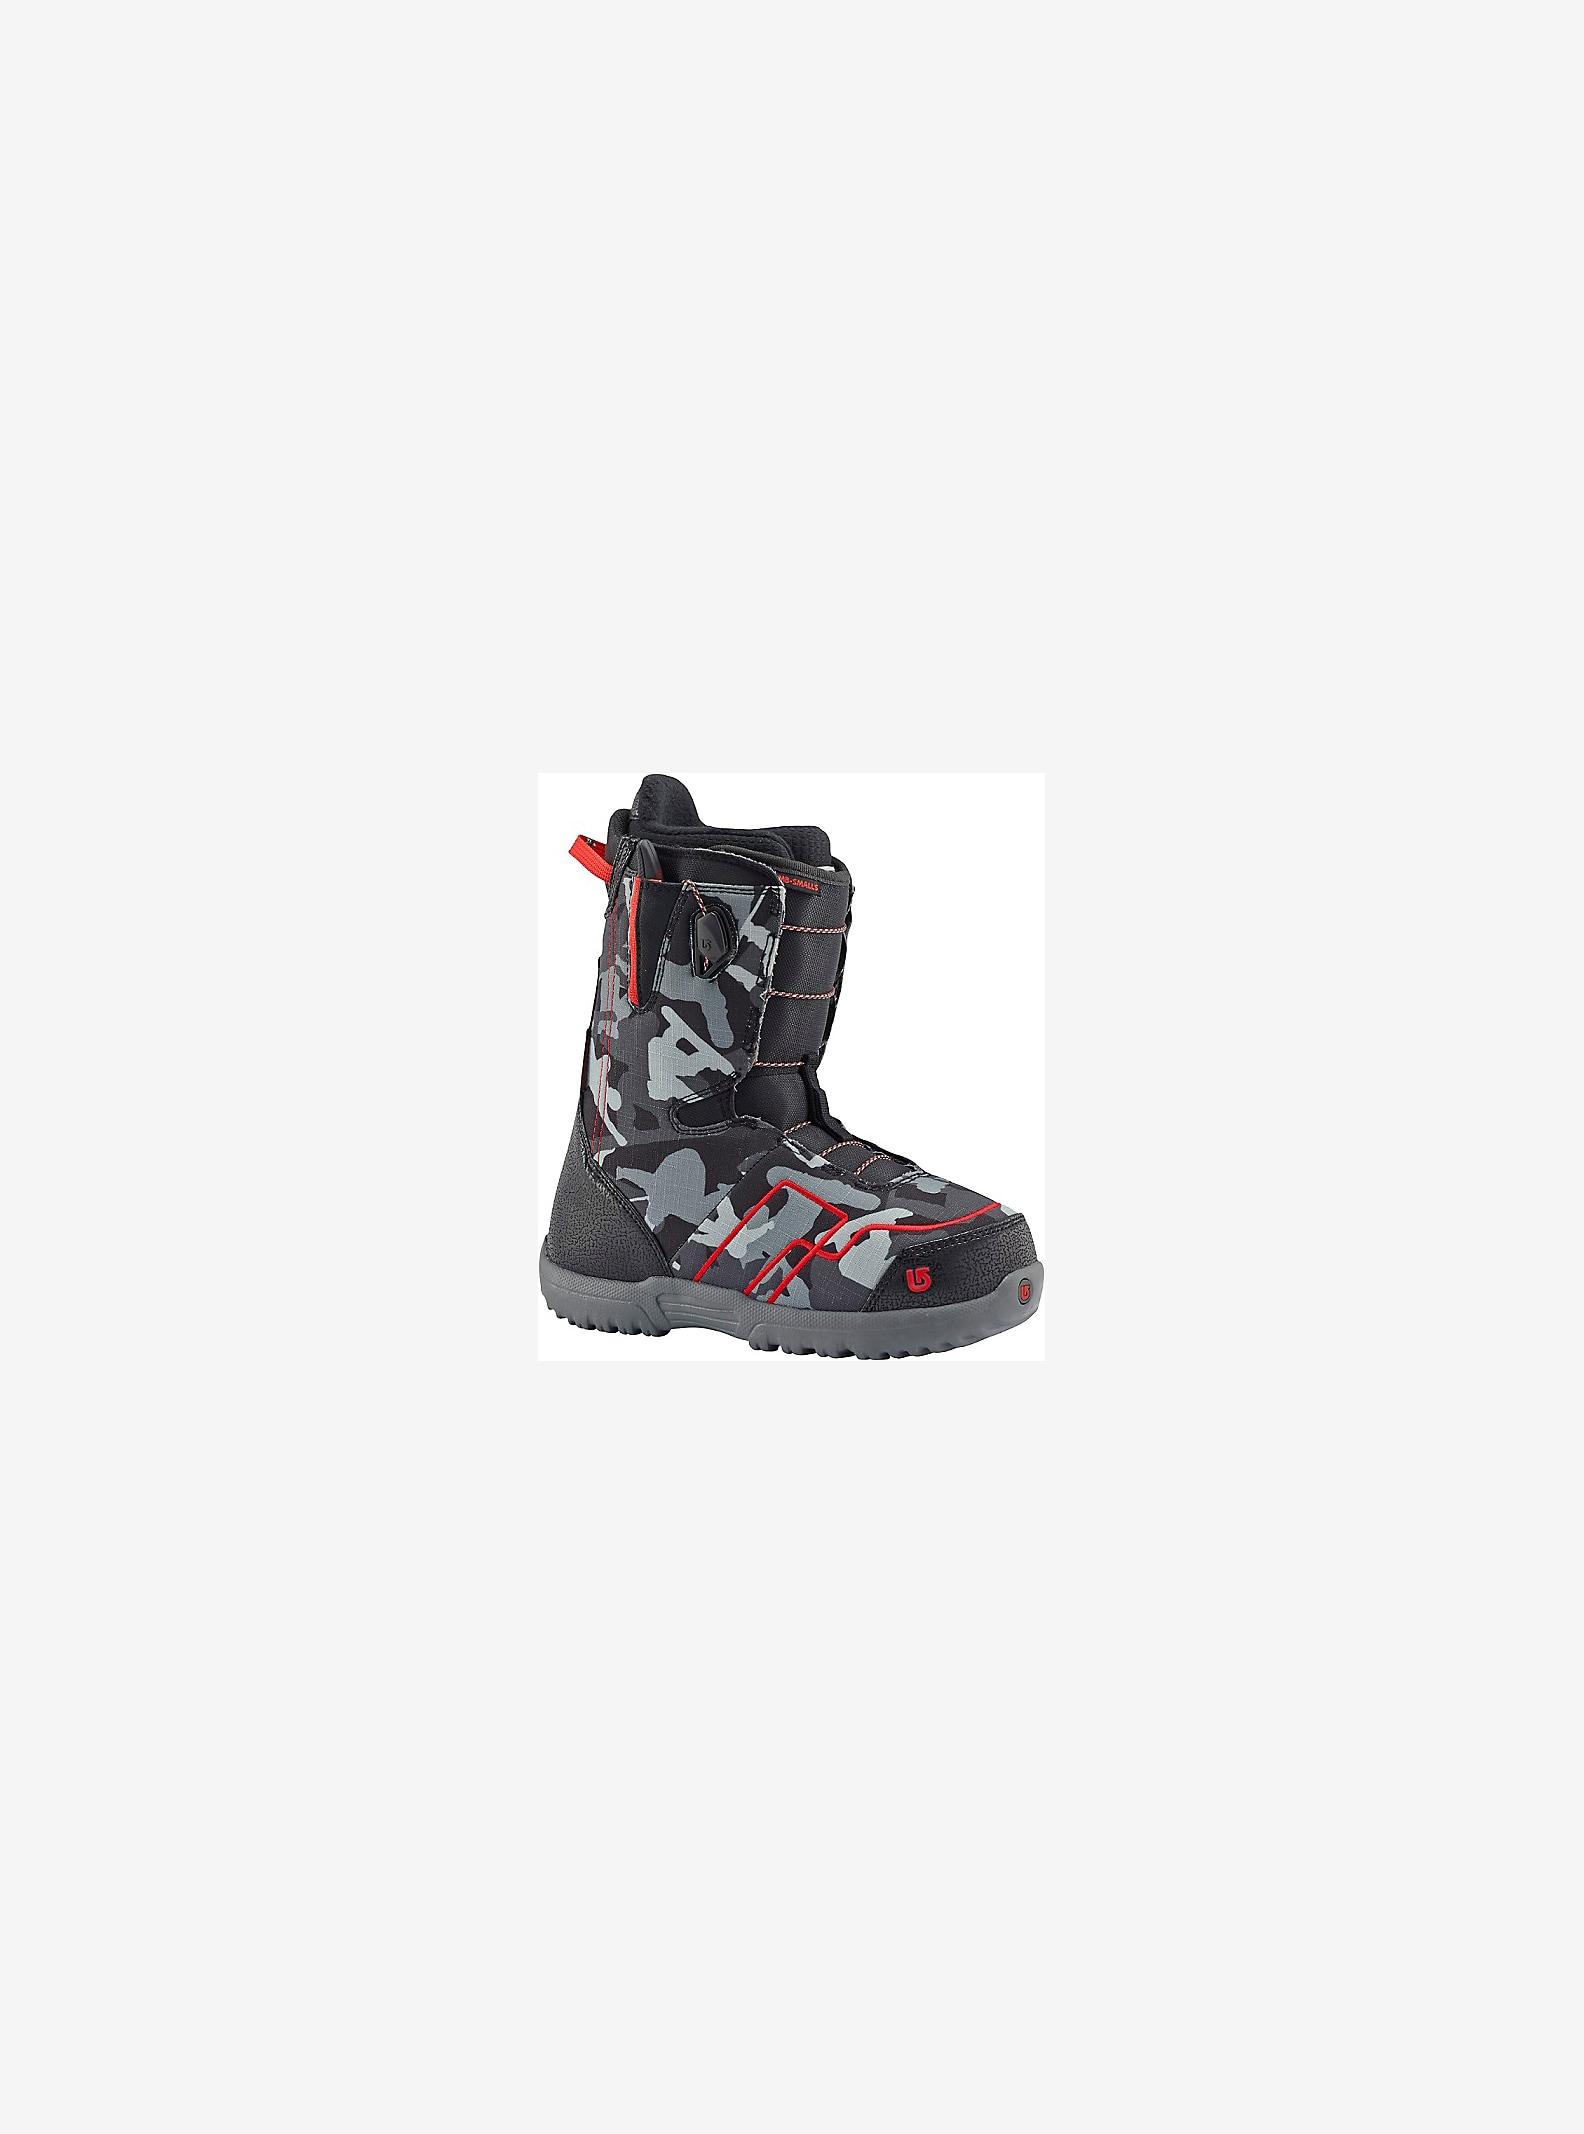 Burton Stash Hunter Jr. Snowboard Boot shown in Black / Red